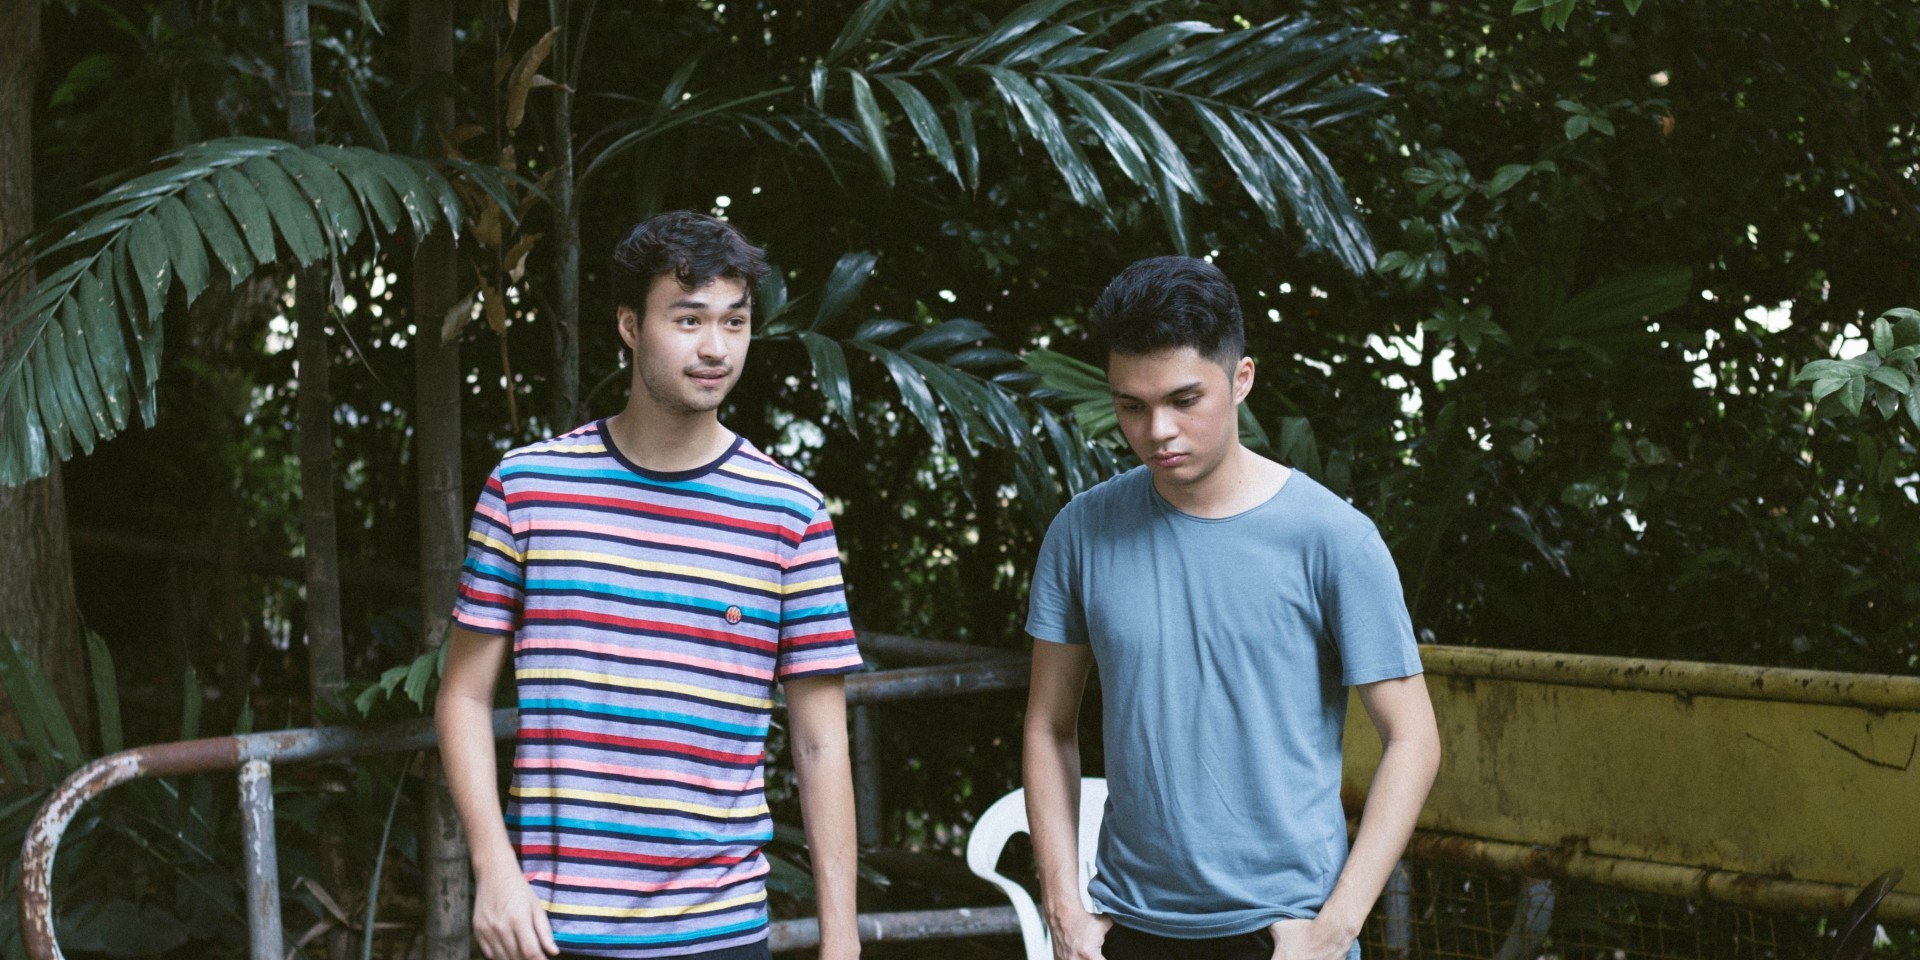 Singaporean duo Islandeer releases pristine debut single 'Momento' – listen